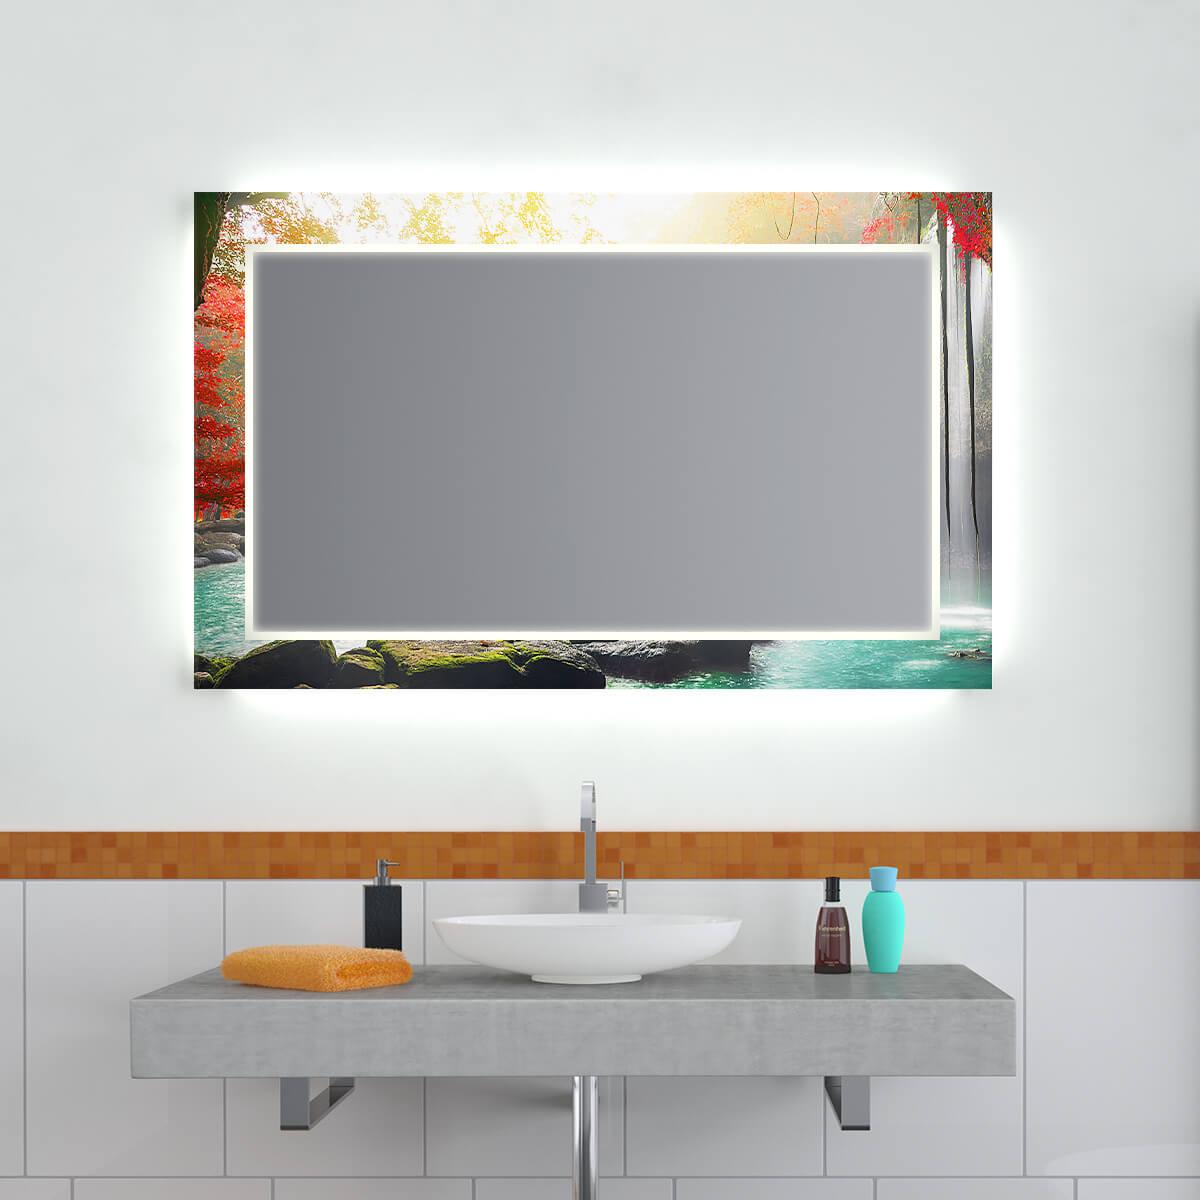 Design Effekt Spiegel Kaskade